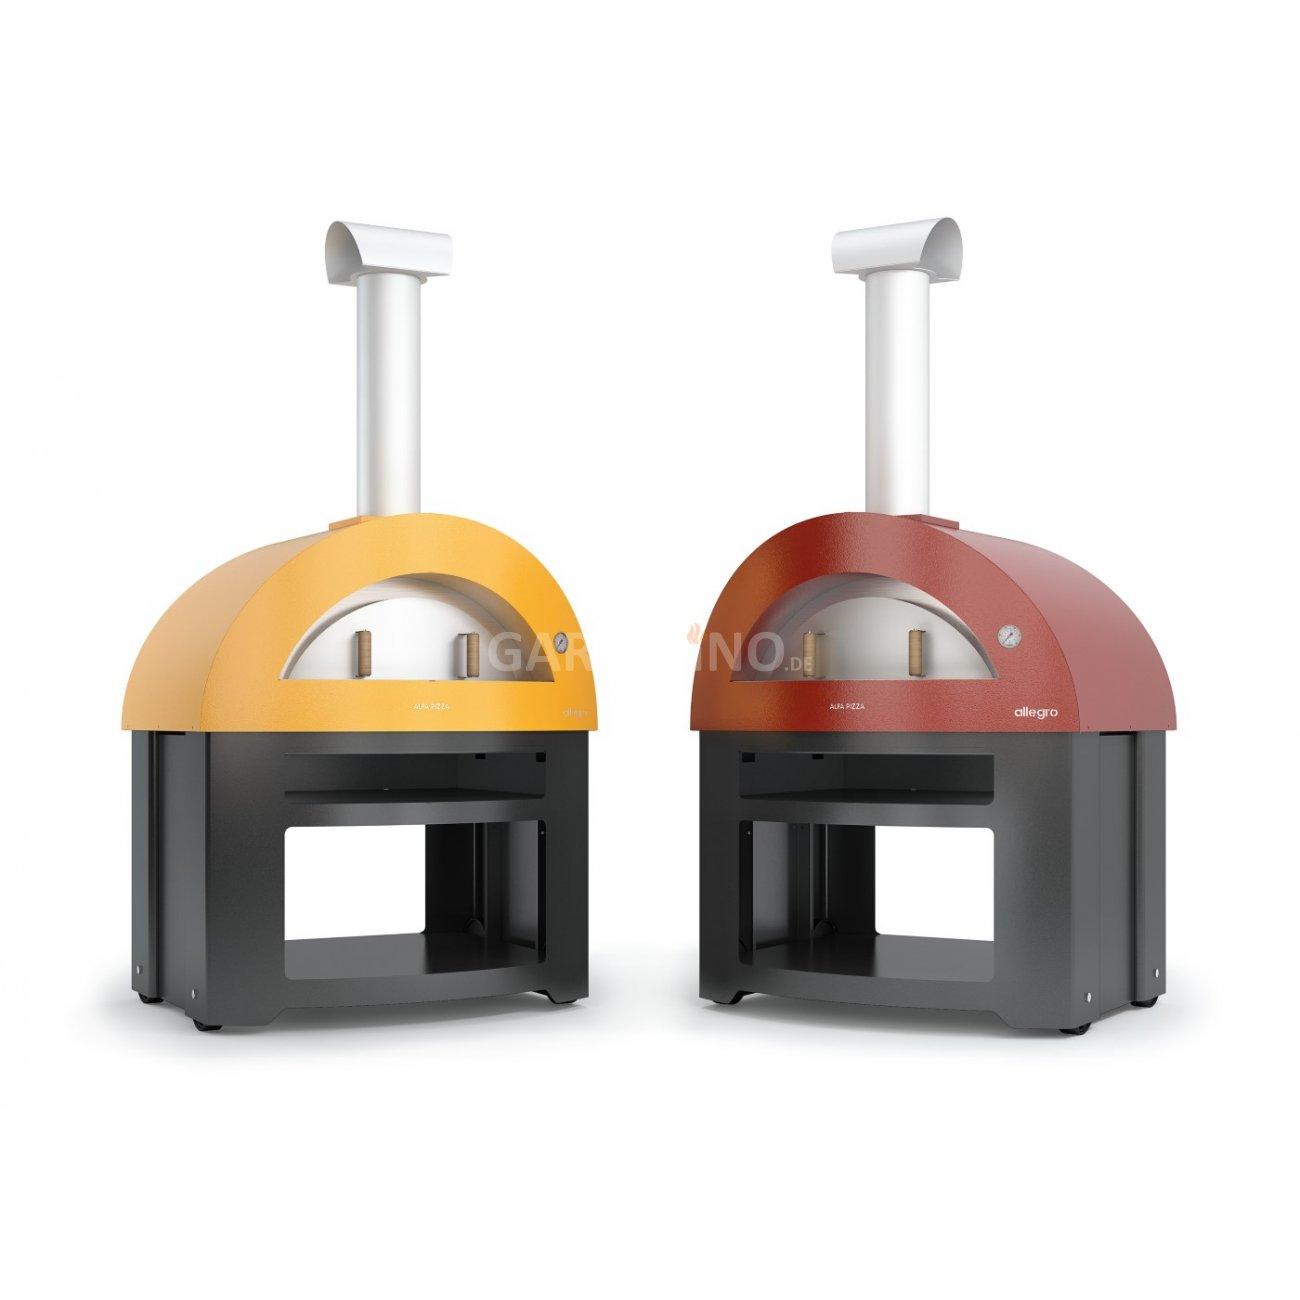 alfa pizza allegro gro er pizzaofen aus italien f r den. Black Bedroom Furniture Sets. Home Design Ideas